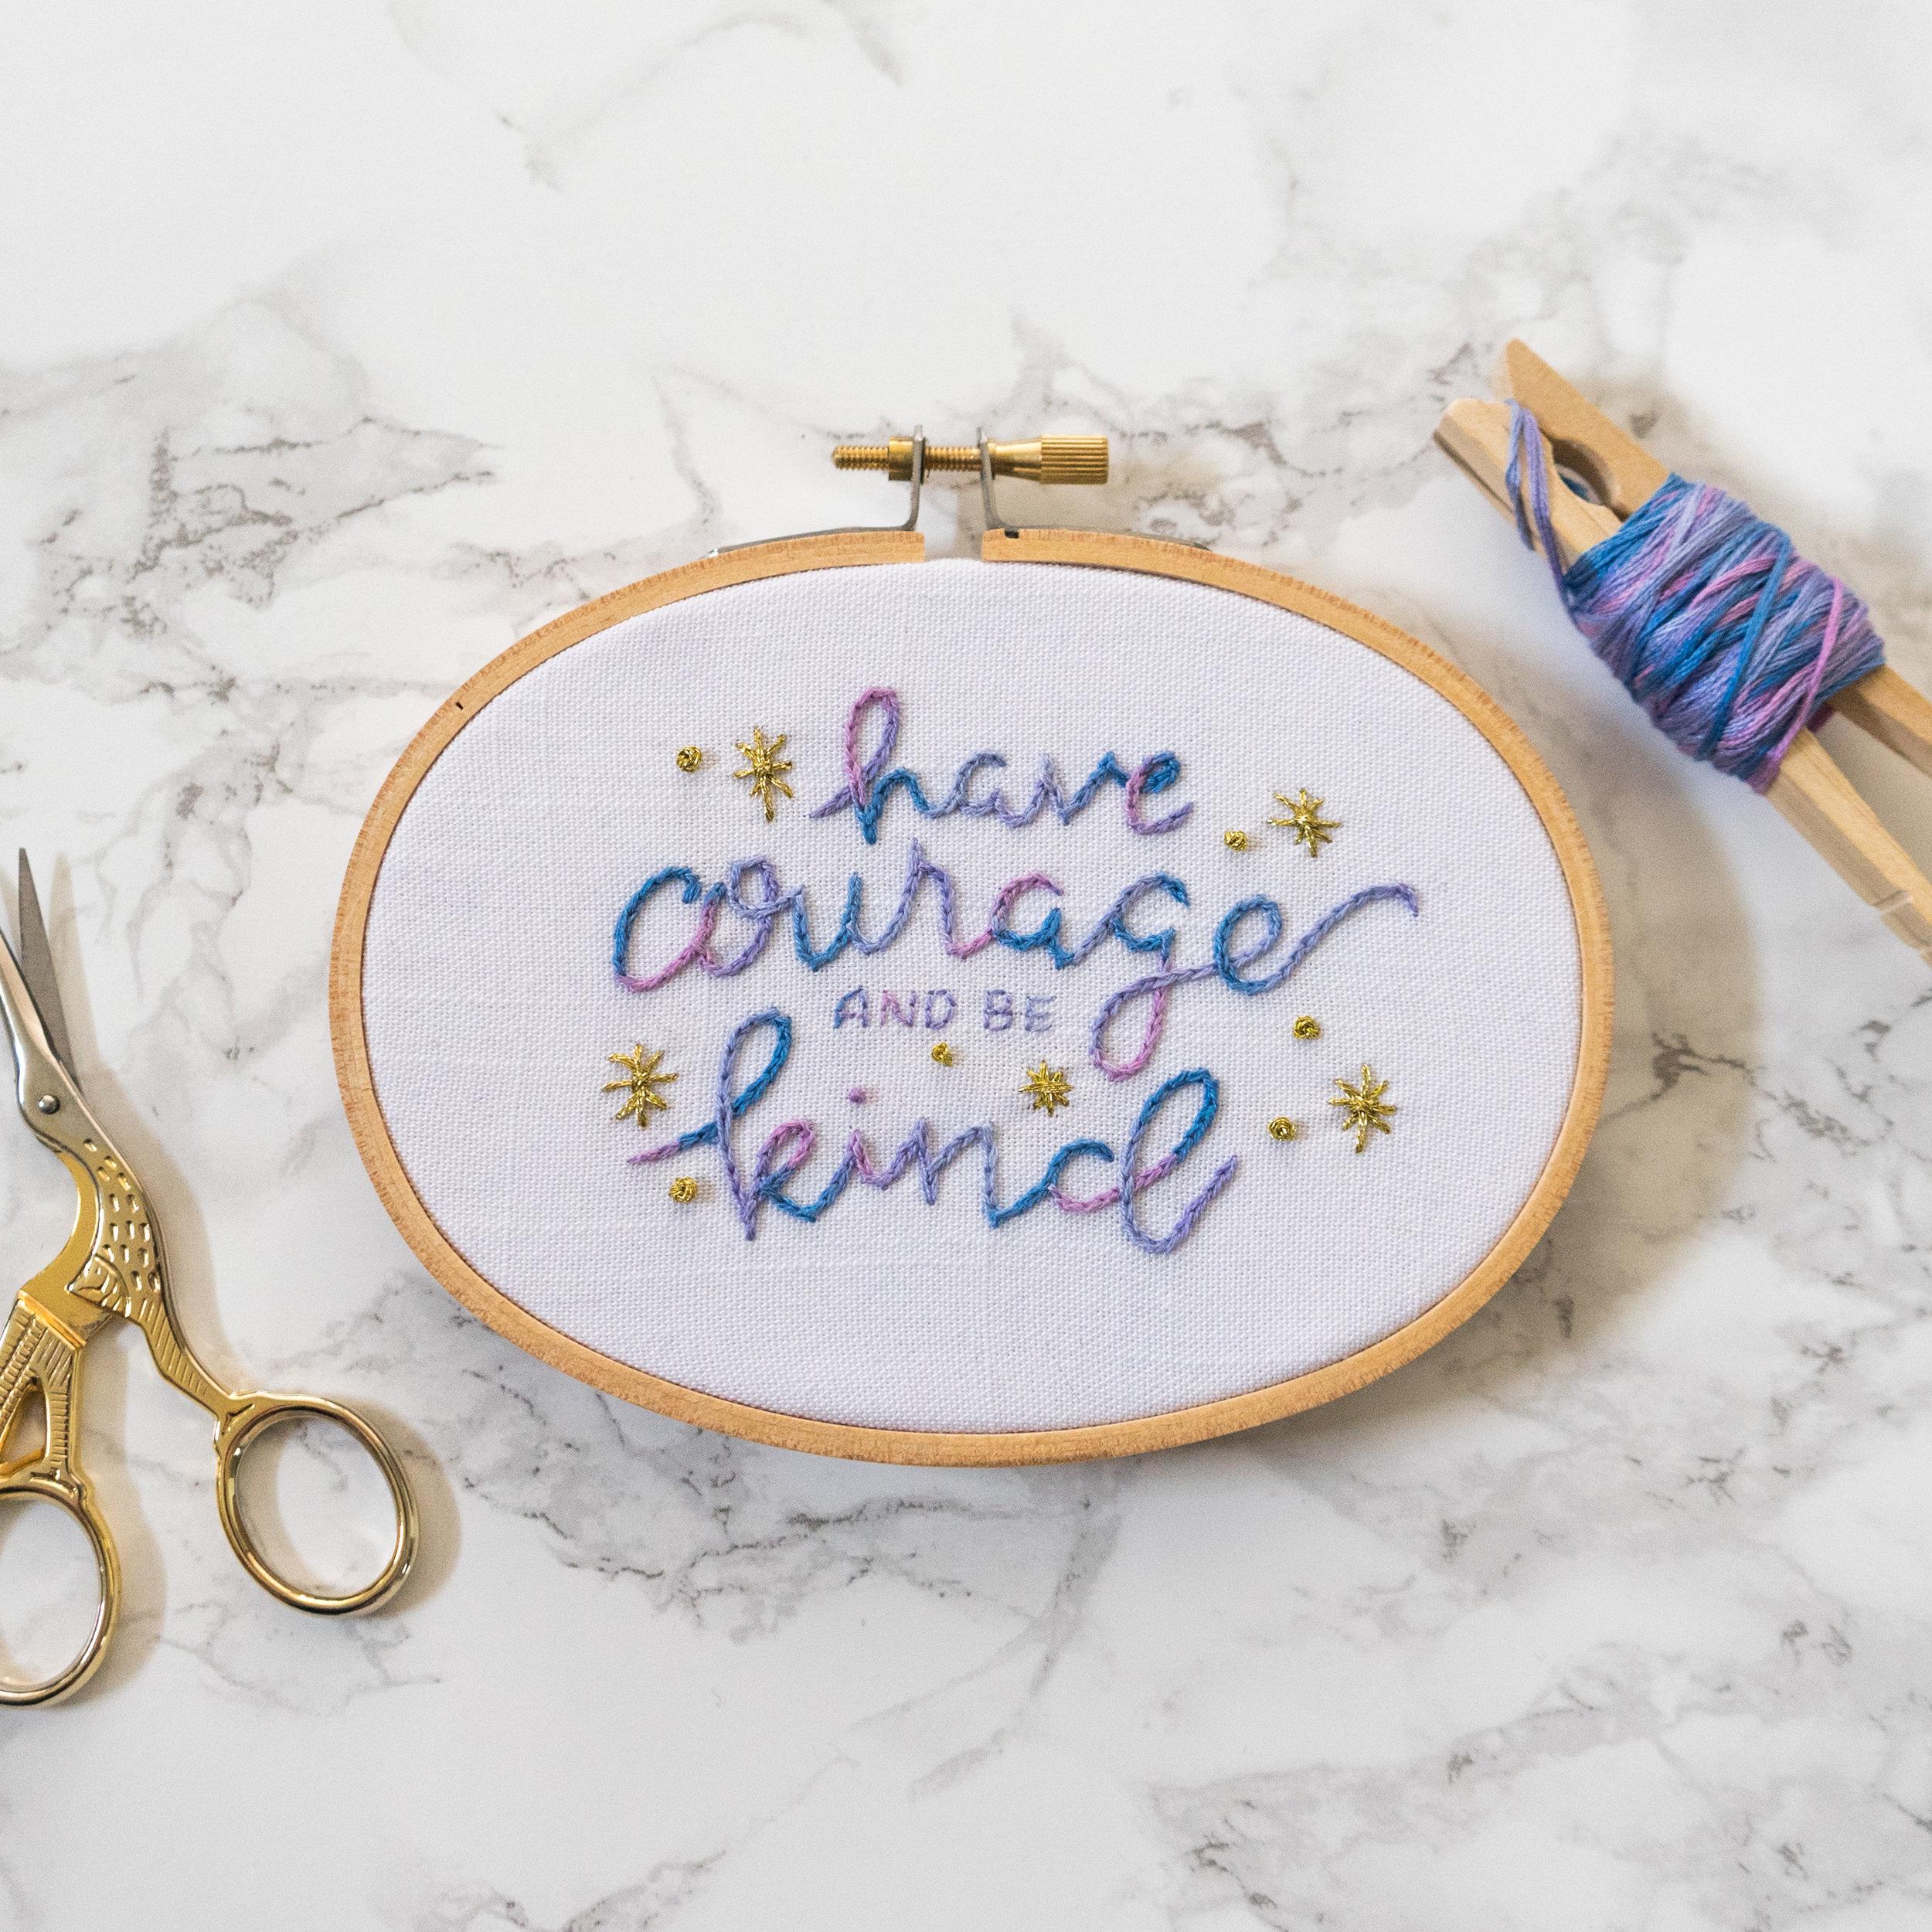 _courage.jpg